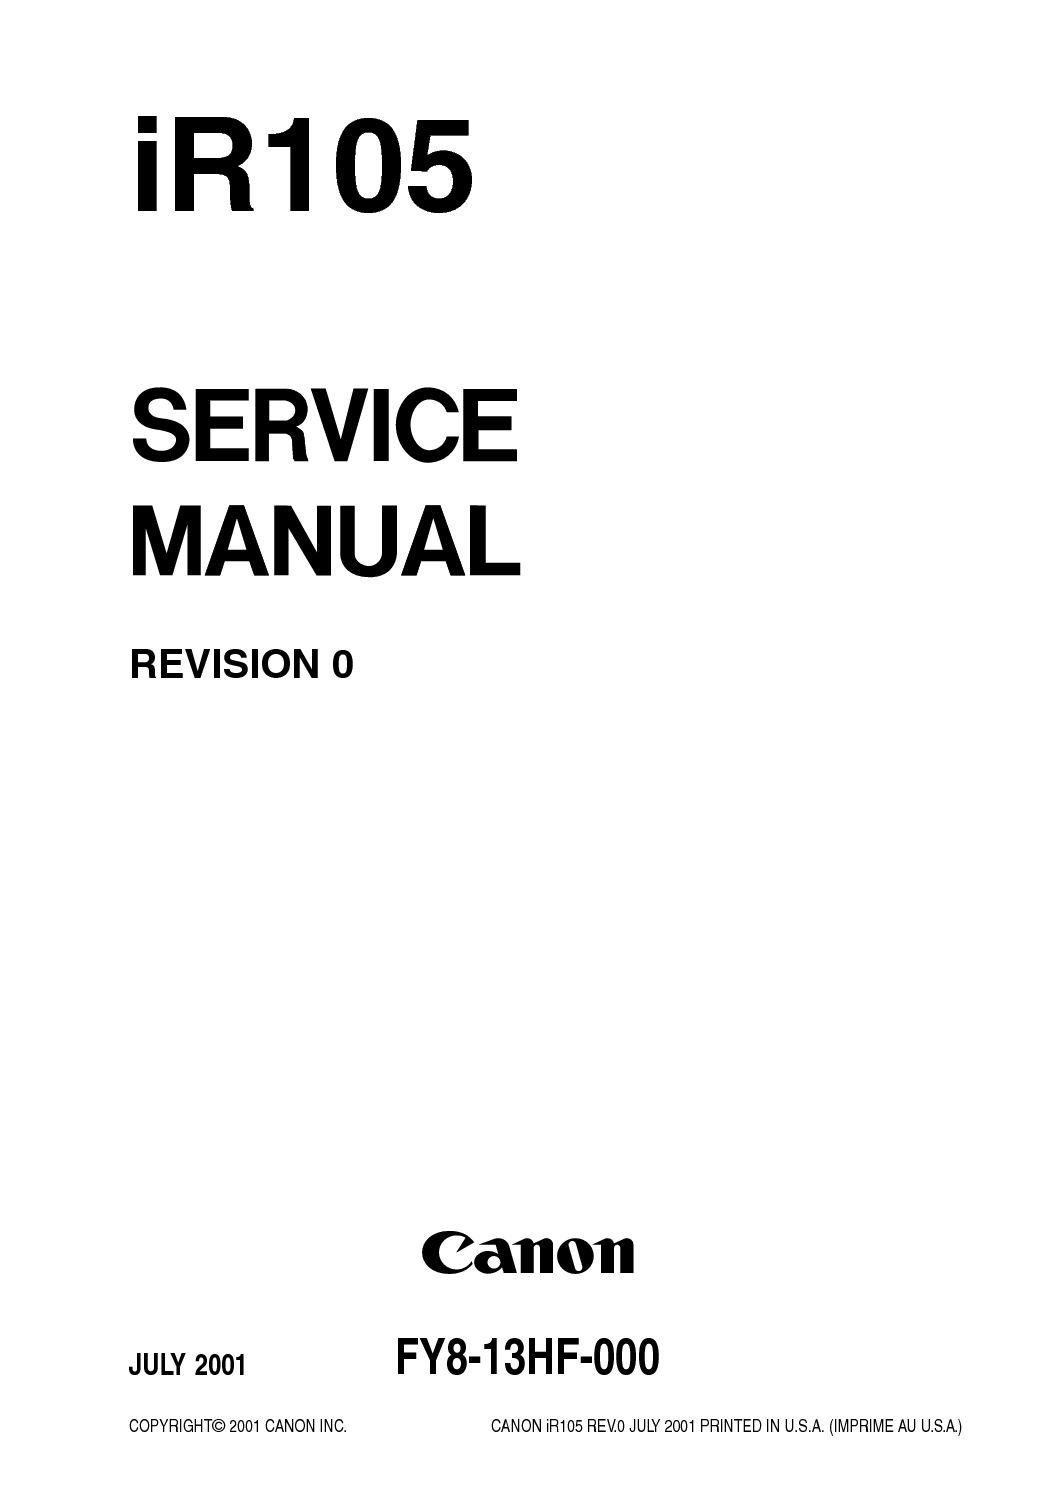 Canon Ir105 Service Manual Pdf